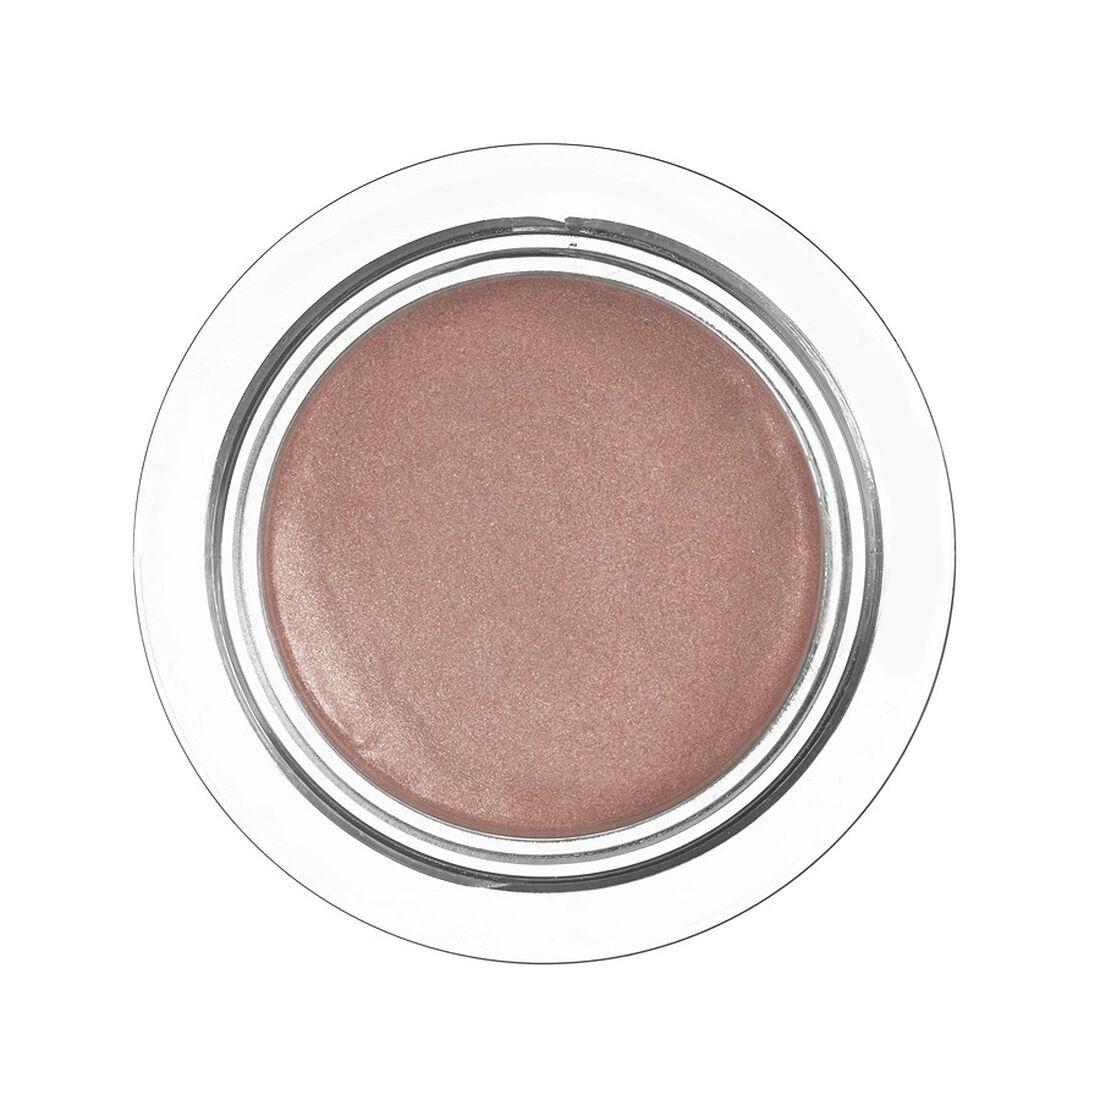 E.l.f Cosmetics - Smudge Pot Cream Eyeshadow